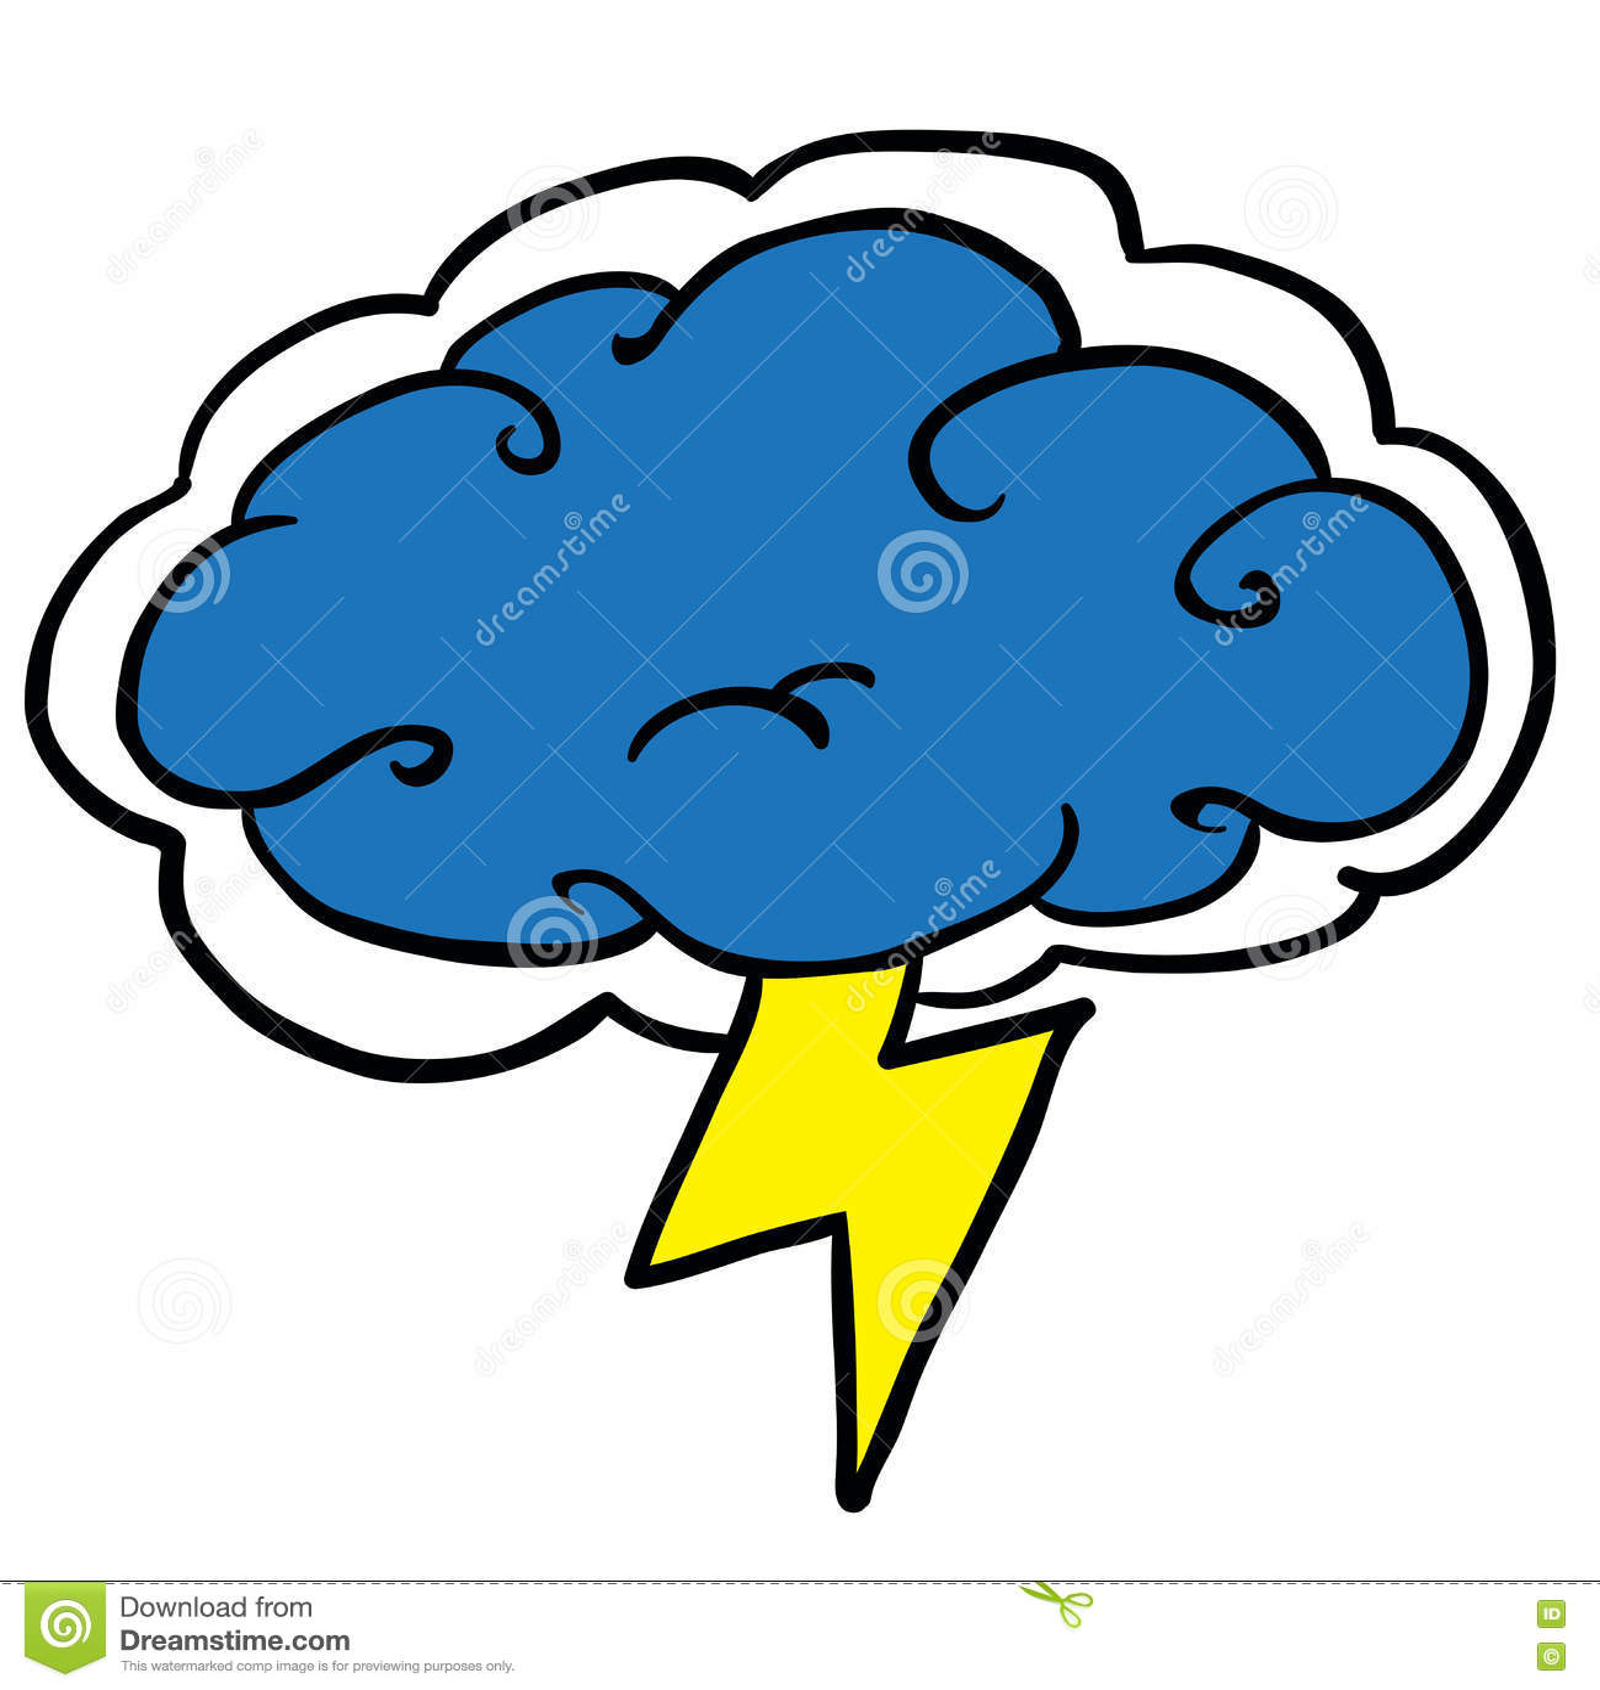 Cartoon storm cloud stock vector. Illustration of storm ...   Cartoon Storm